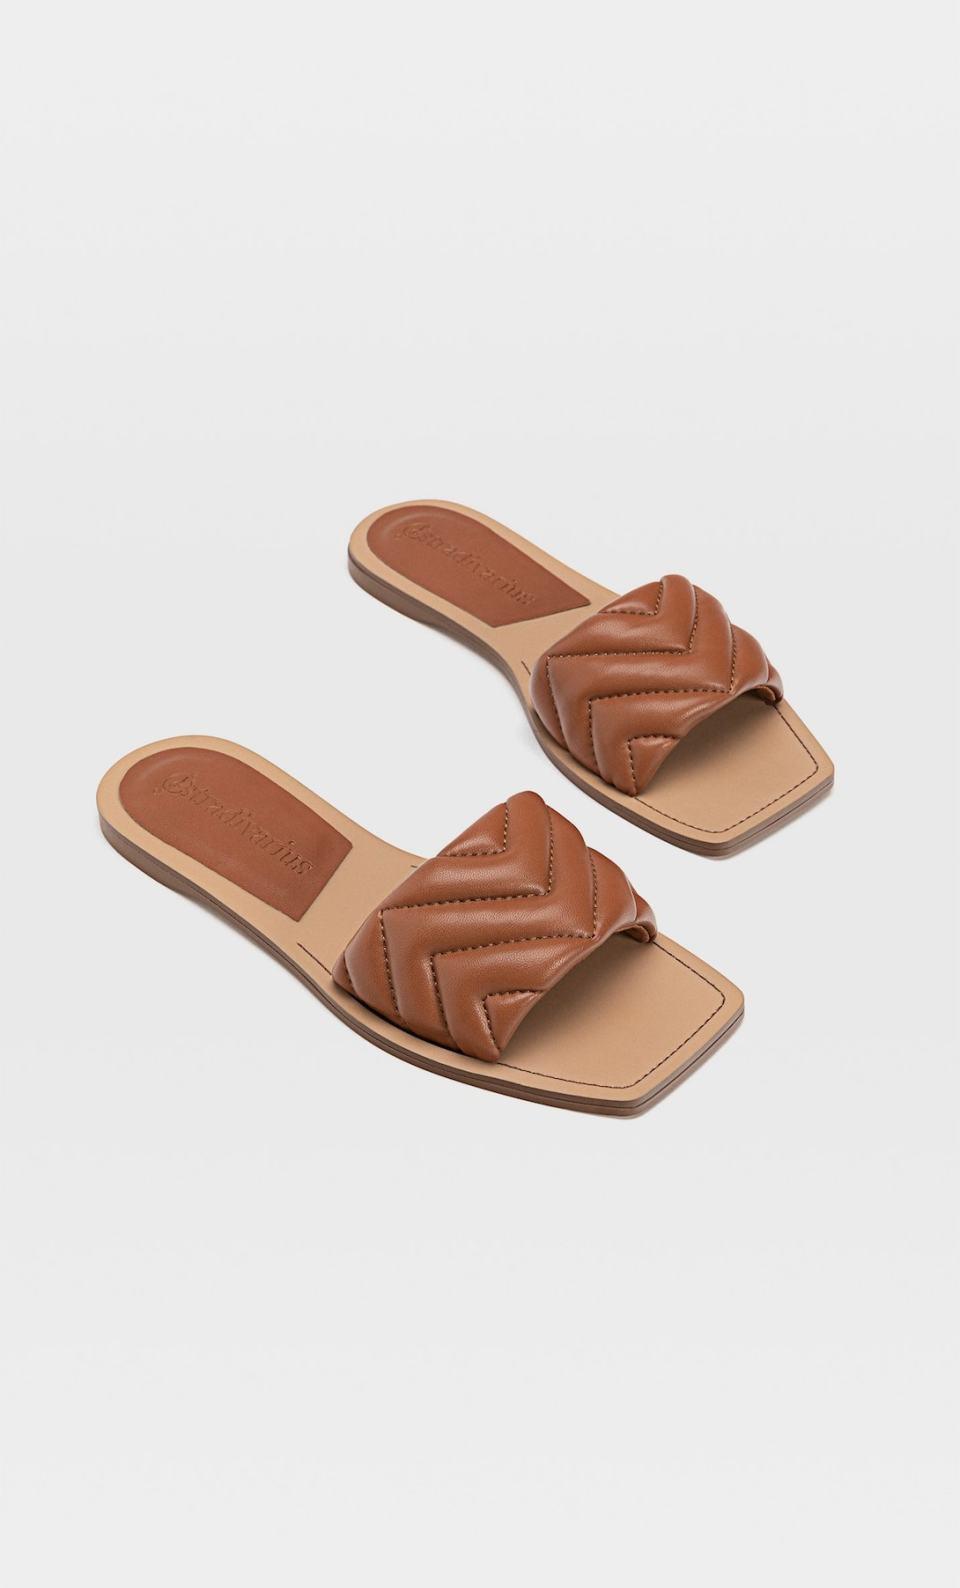 sandales plates marrons